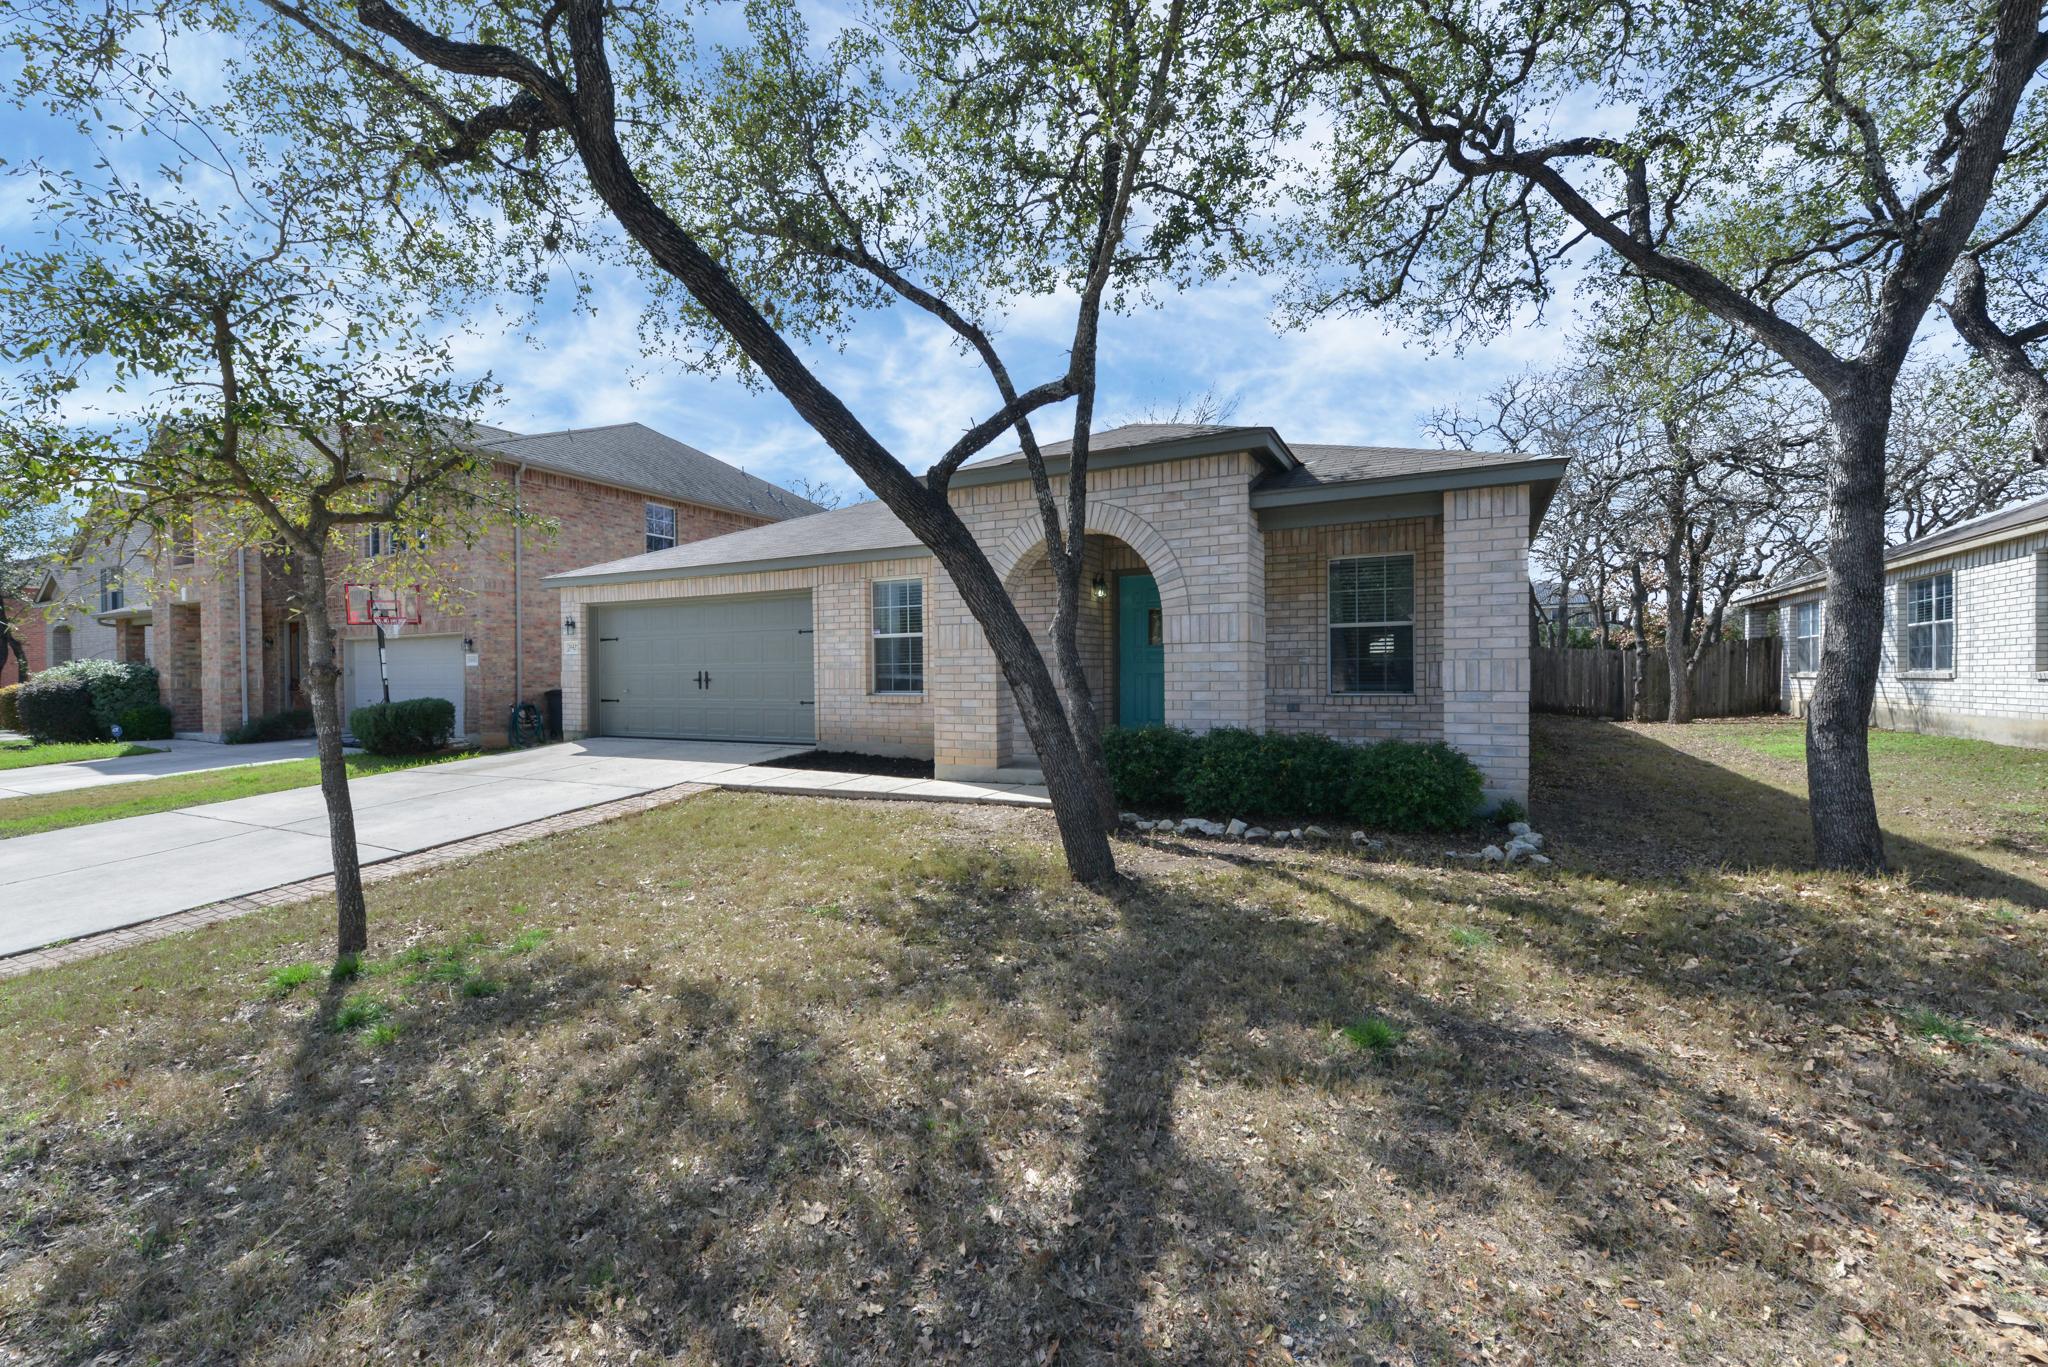 Best Property Management Company in San Antonio, Boerne, New Braunfels